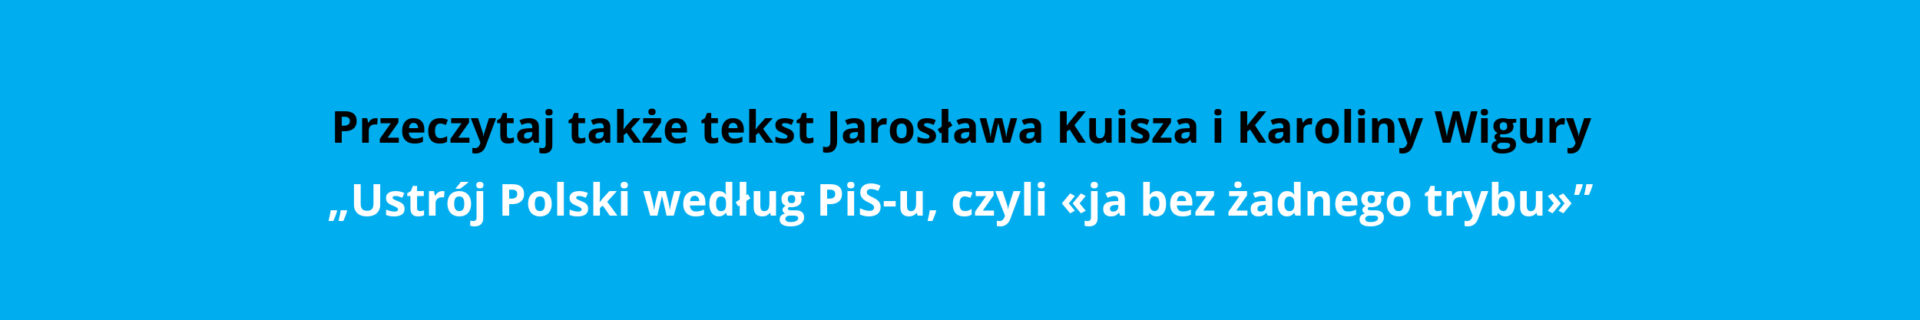 kuiszwigura (1)